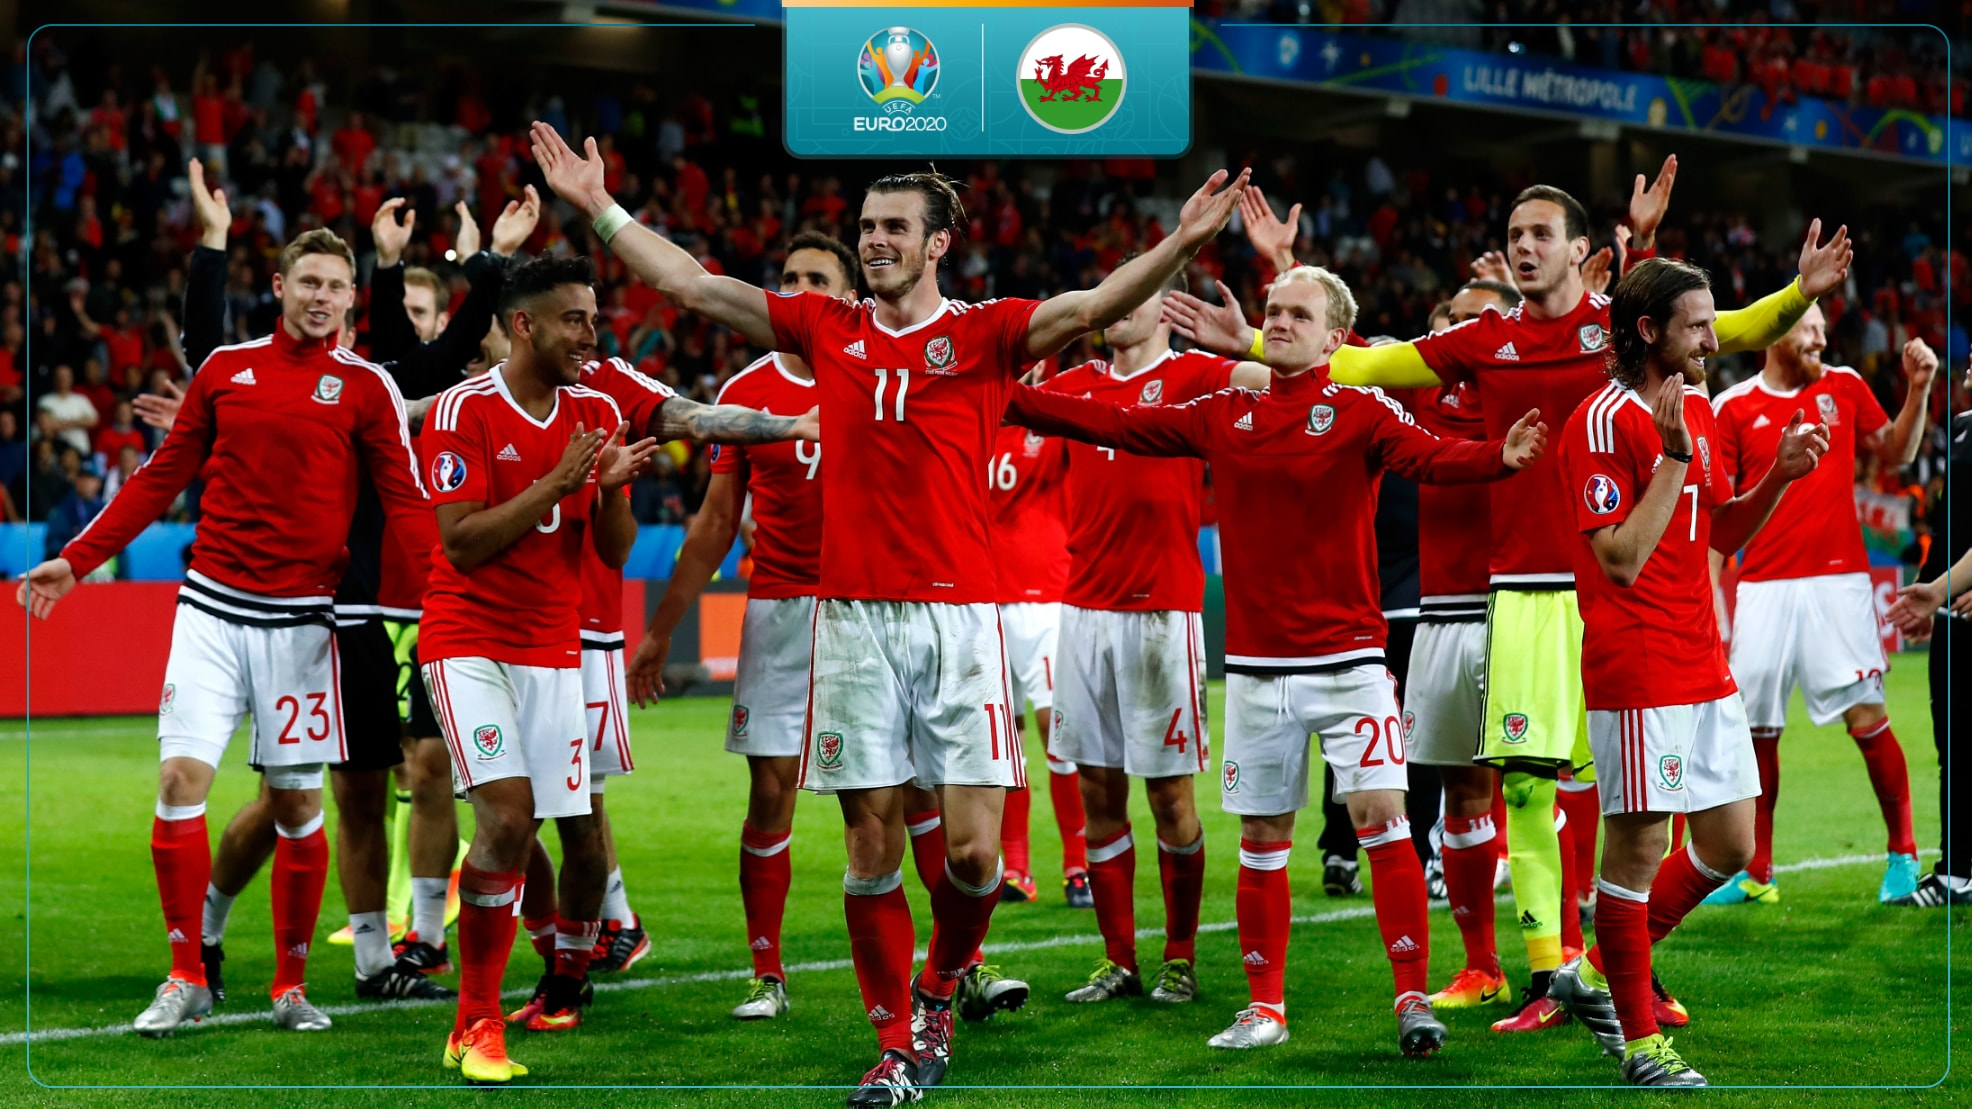 EURO contenders: Wales